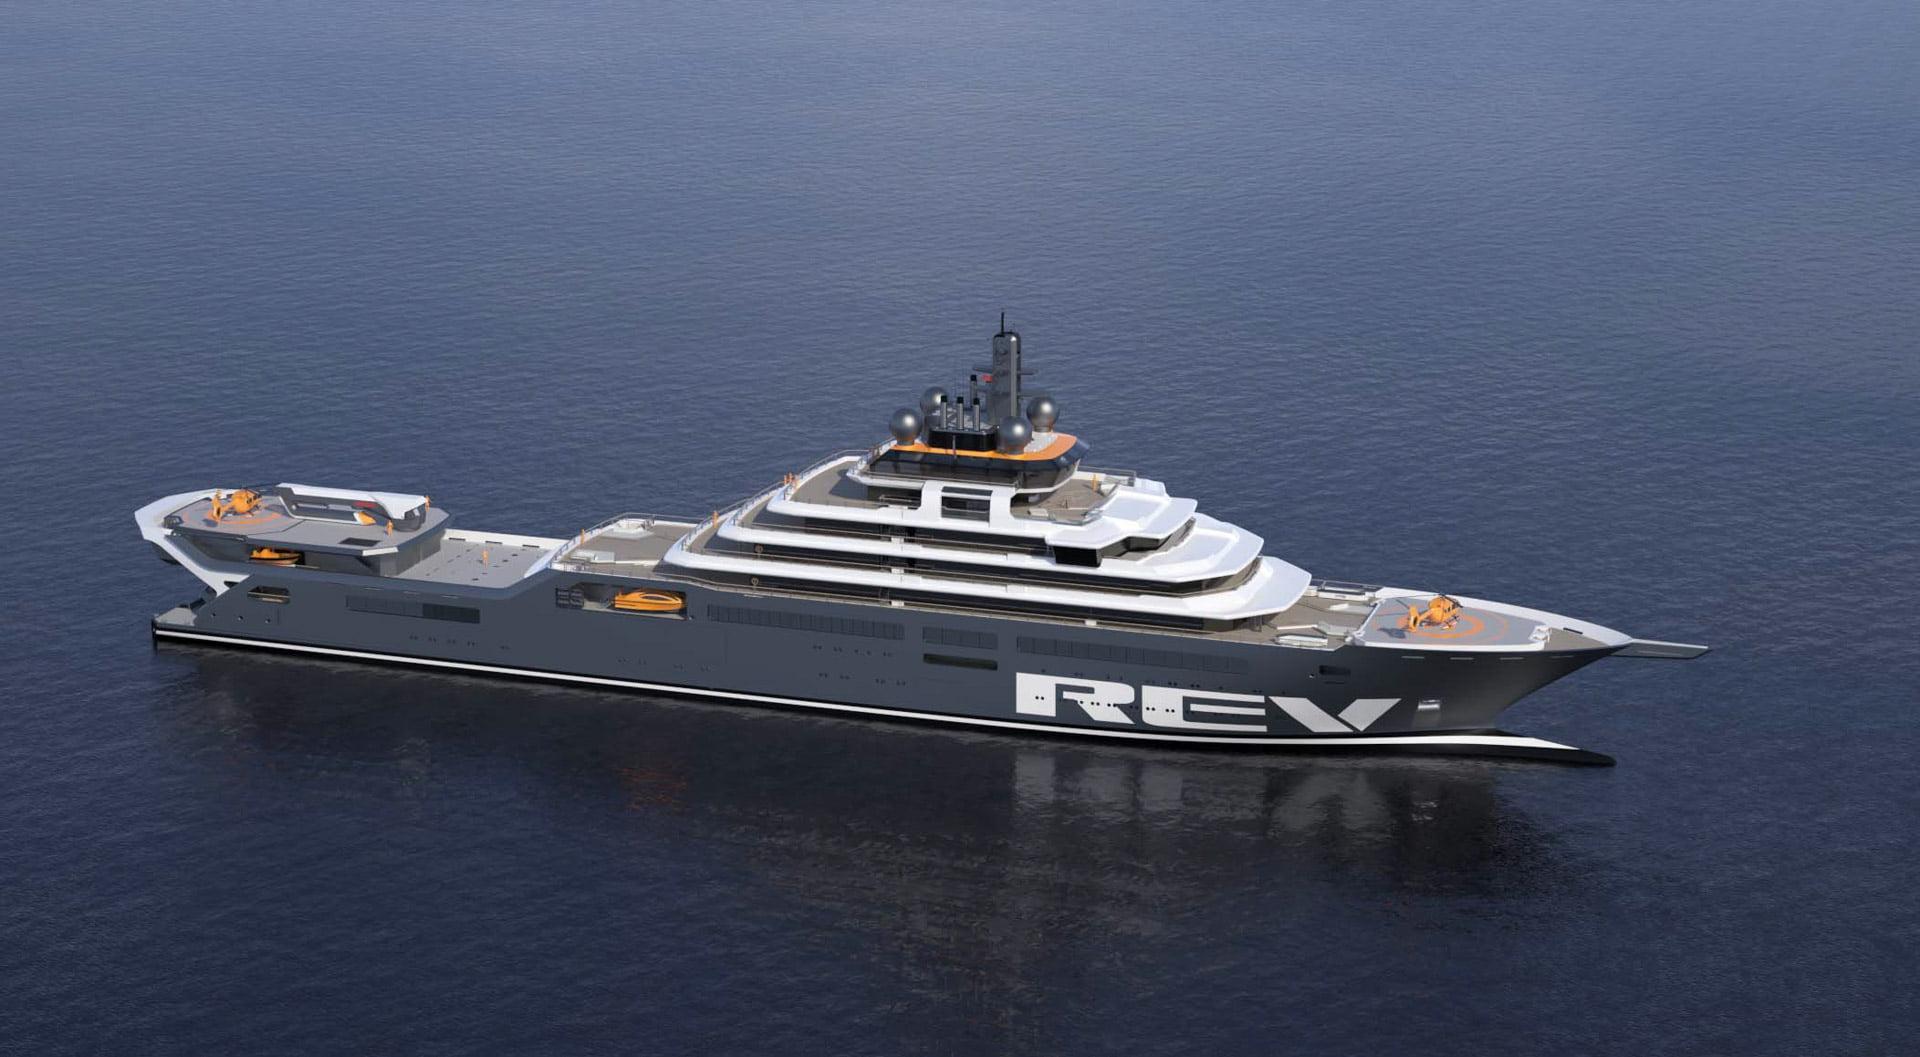 Rev Ocean Superyacht by Vard